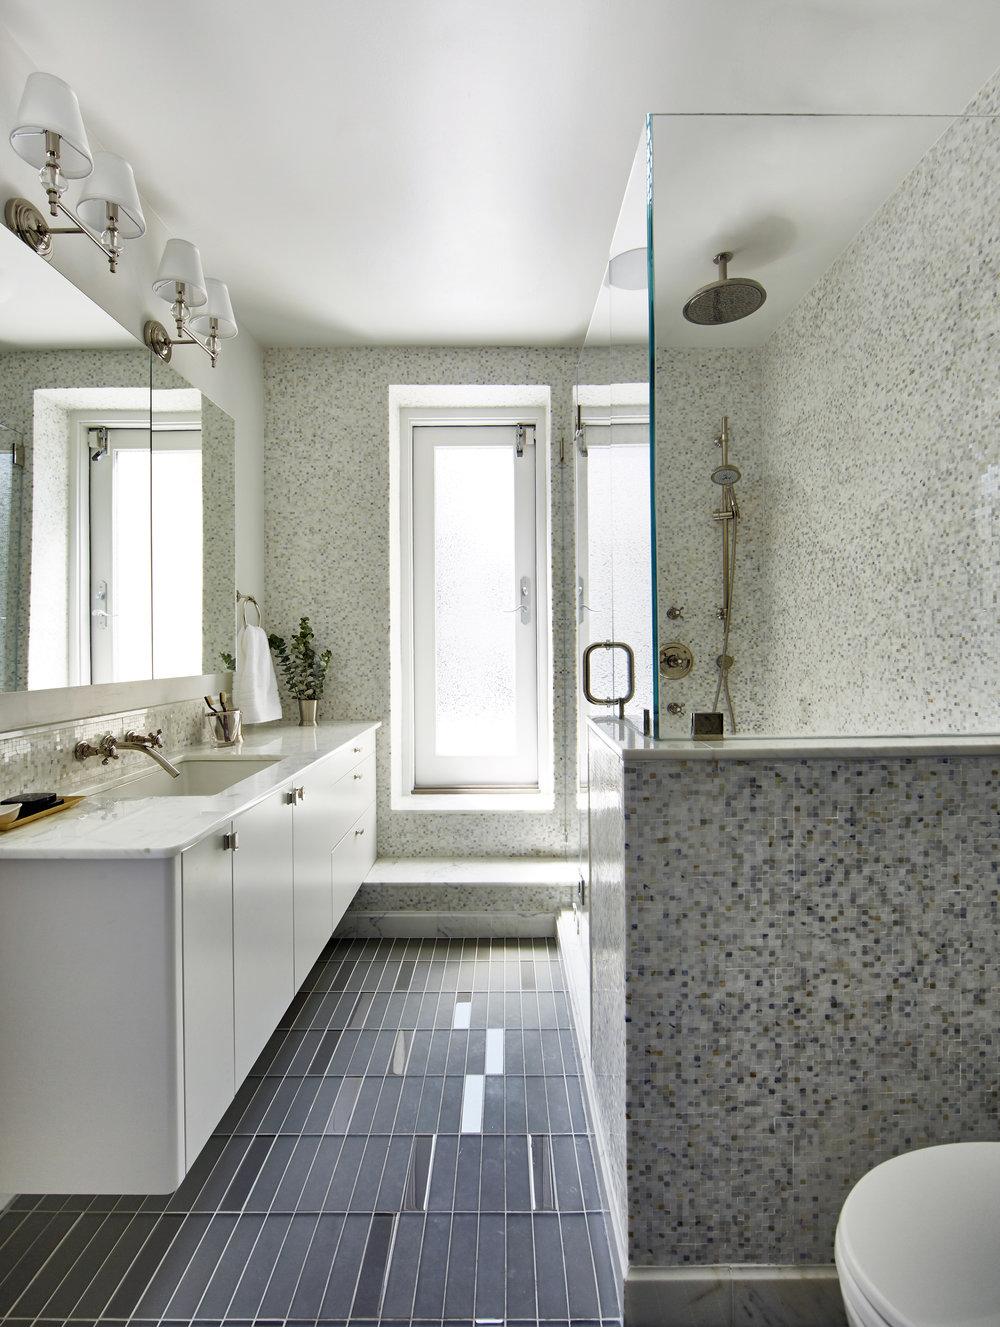 Luxury-Full-Bathroom-Townhouse-JMorris-Design-Interior-Designer-Brooklyn-New-York-Online.jpg